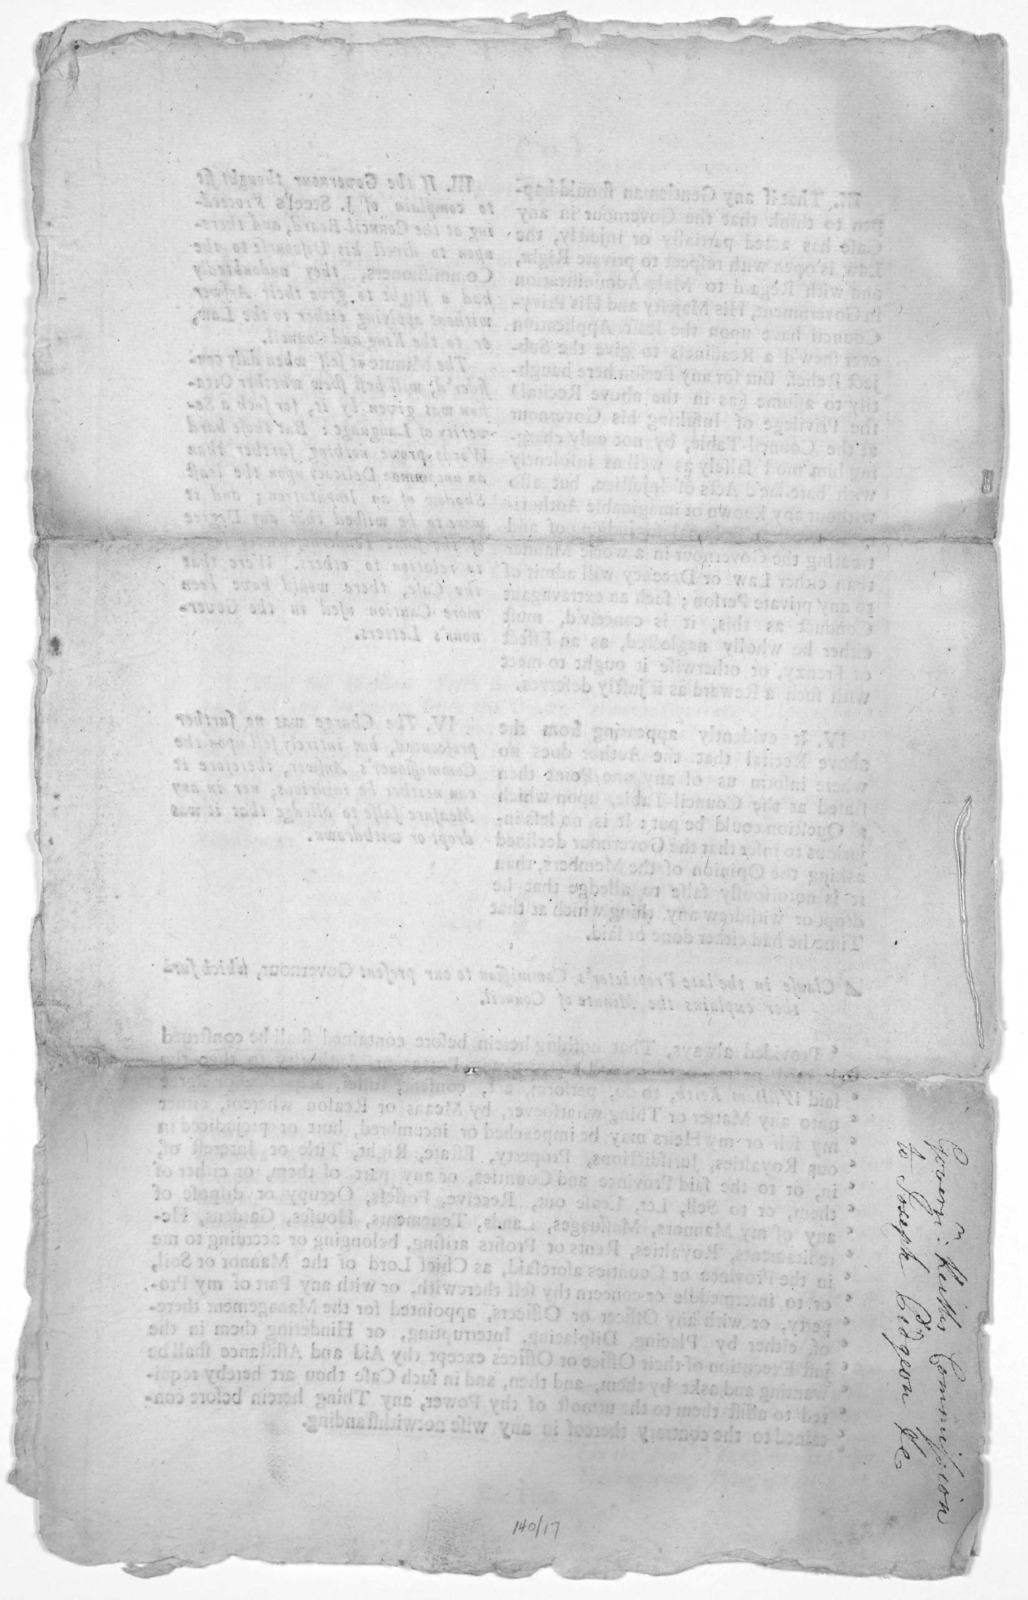 [Governor Keith's commission to Joseph Pidgeon] 1722.